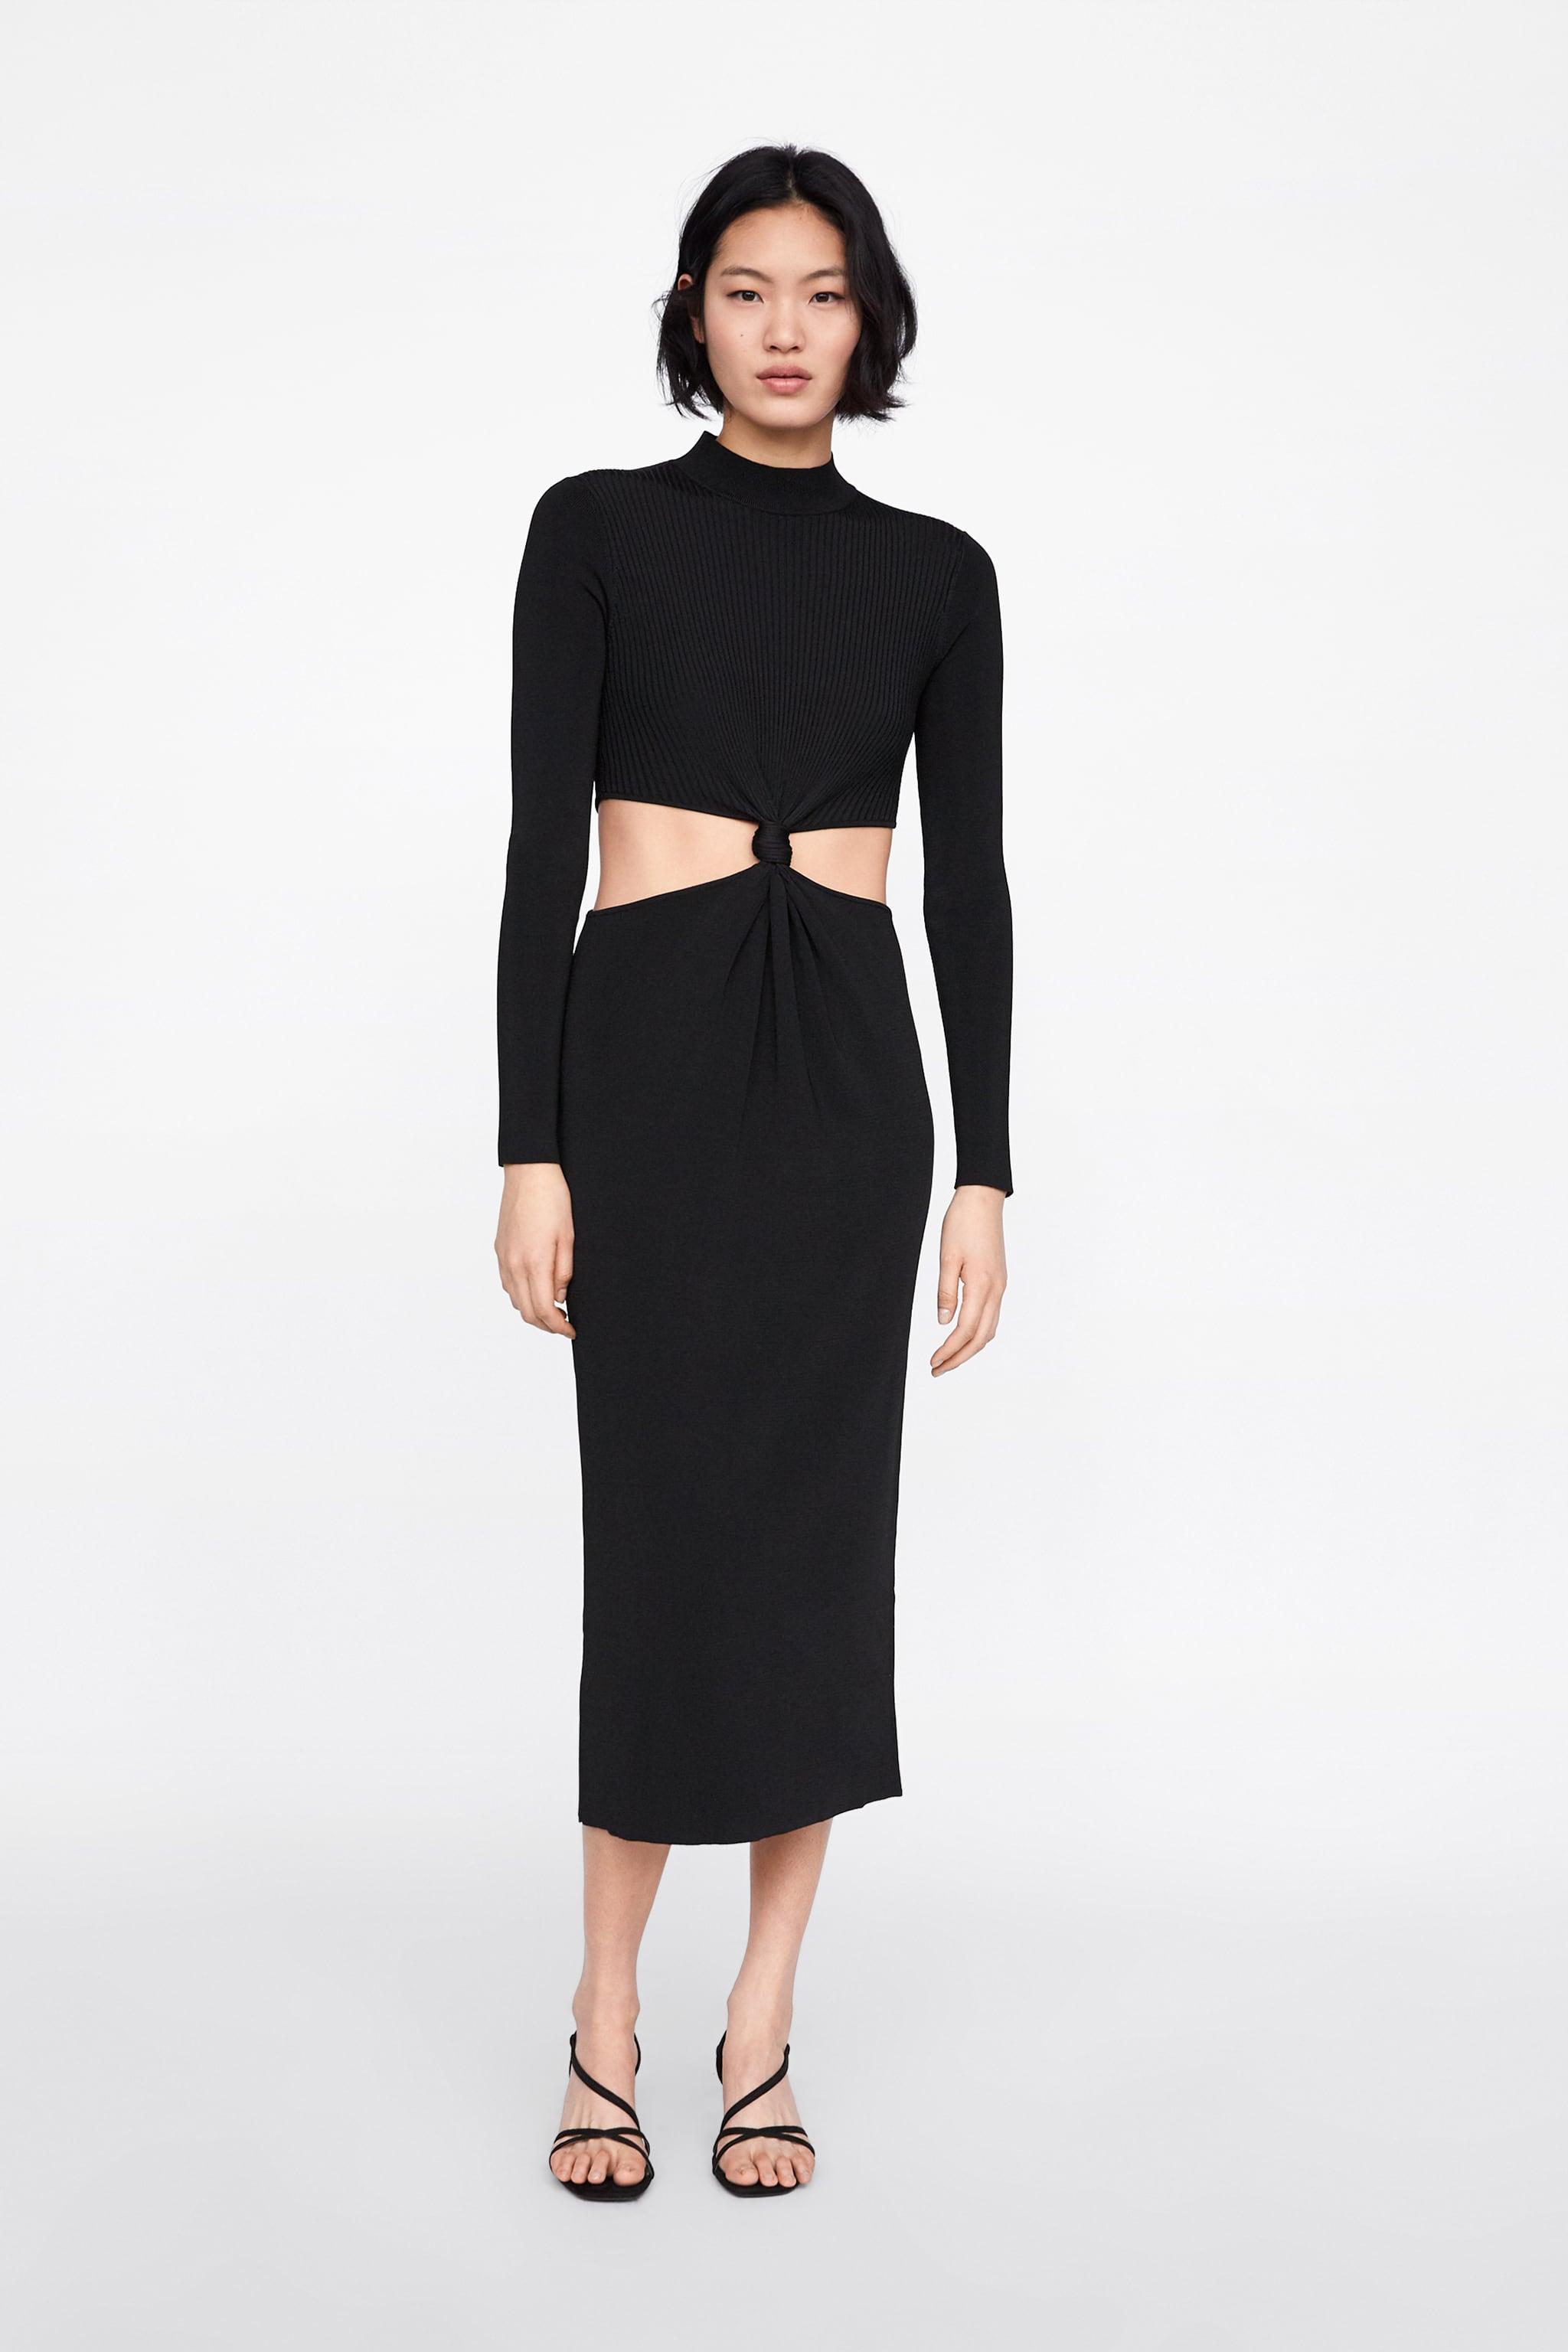 d3ecf52ba7b7 Zara LONG DRESS WITH CUT OUTS AND KNOTS